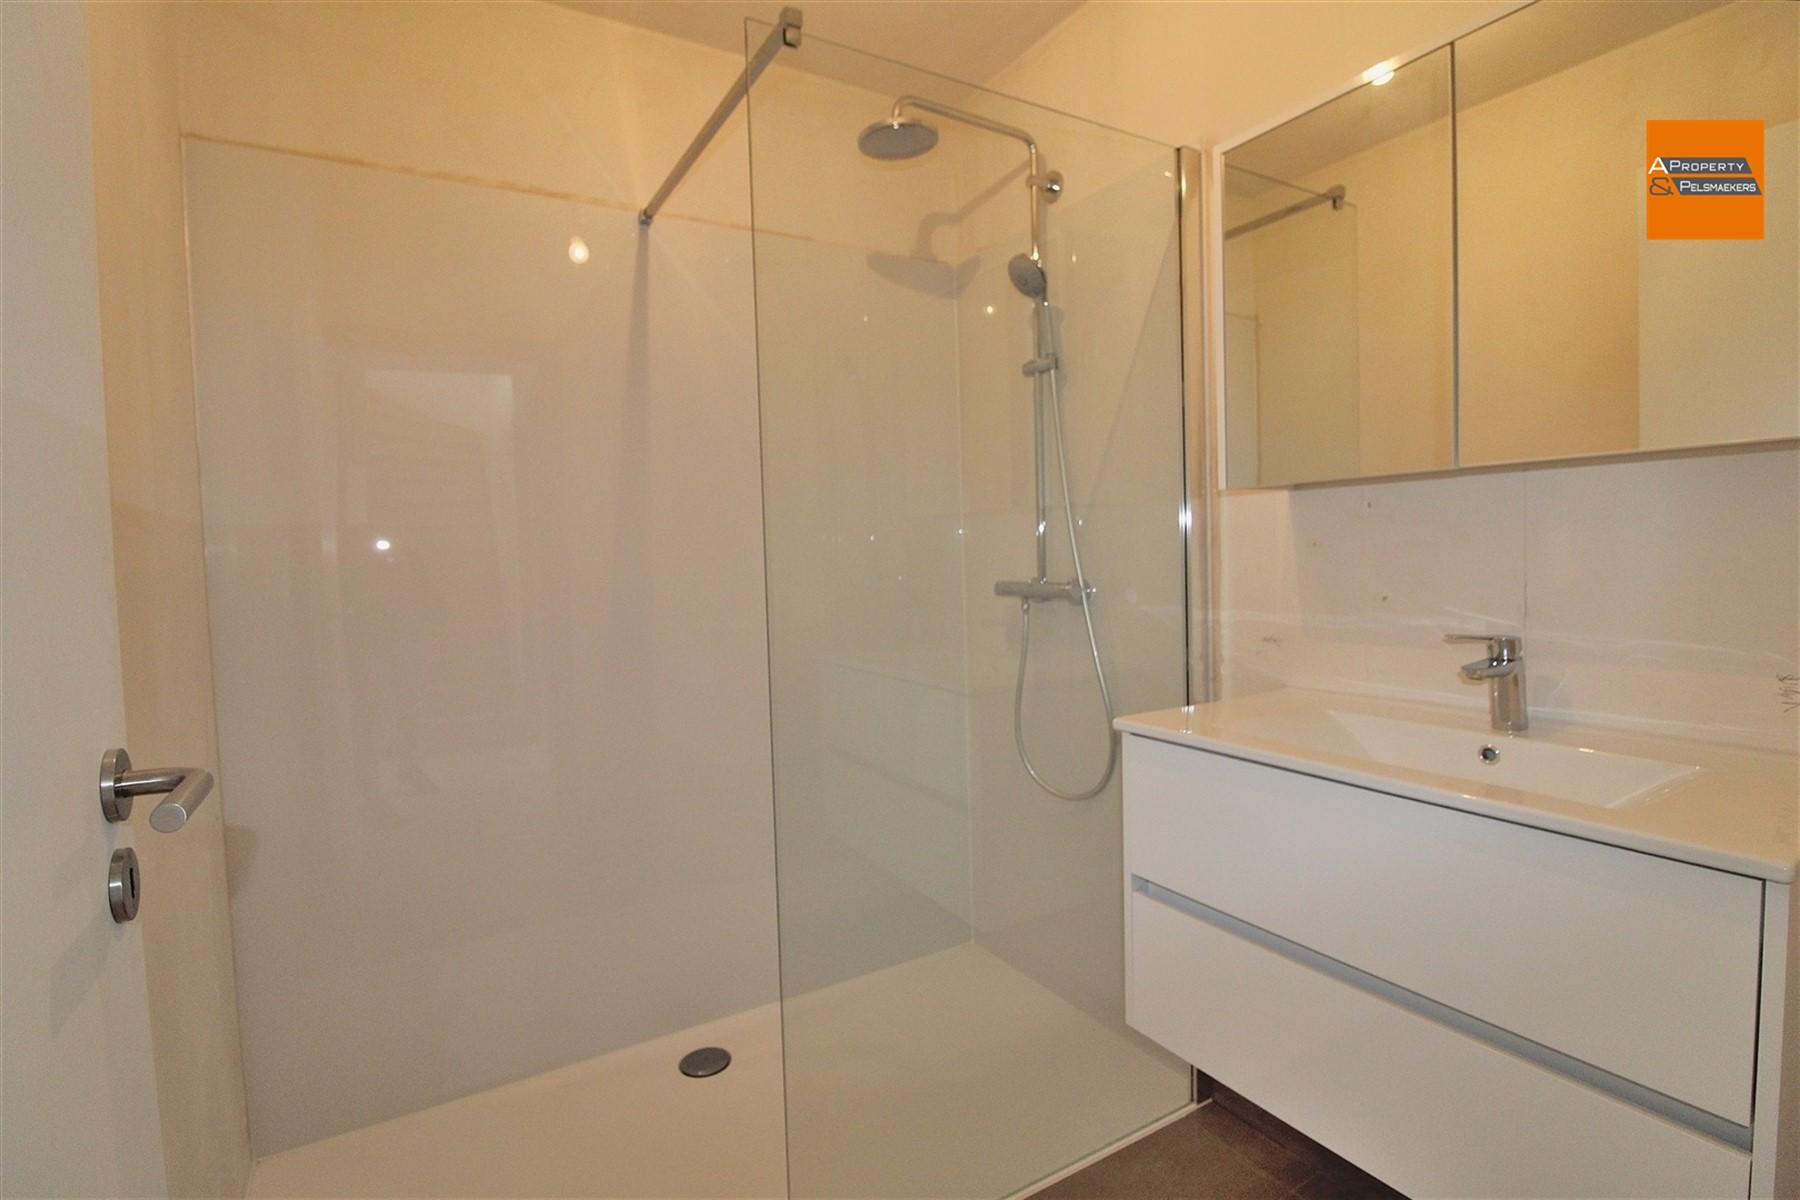 Foto 9 : Duplex/triplex in 3060 BERTEM (België) - Prijs € 319.000